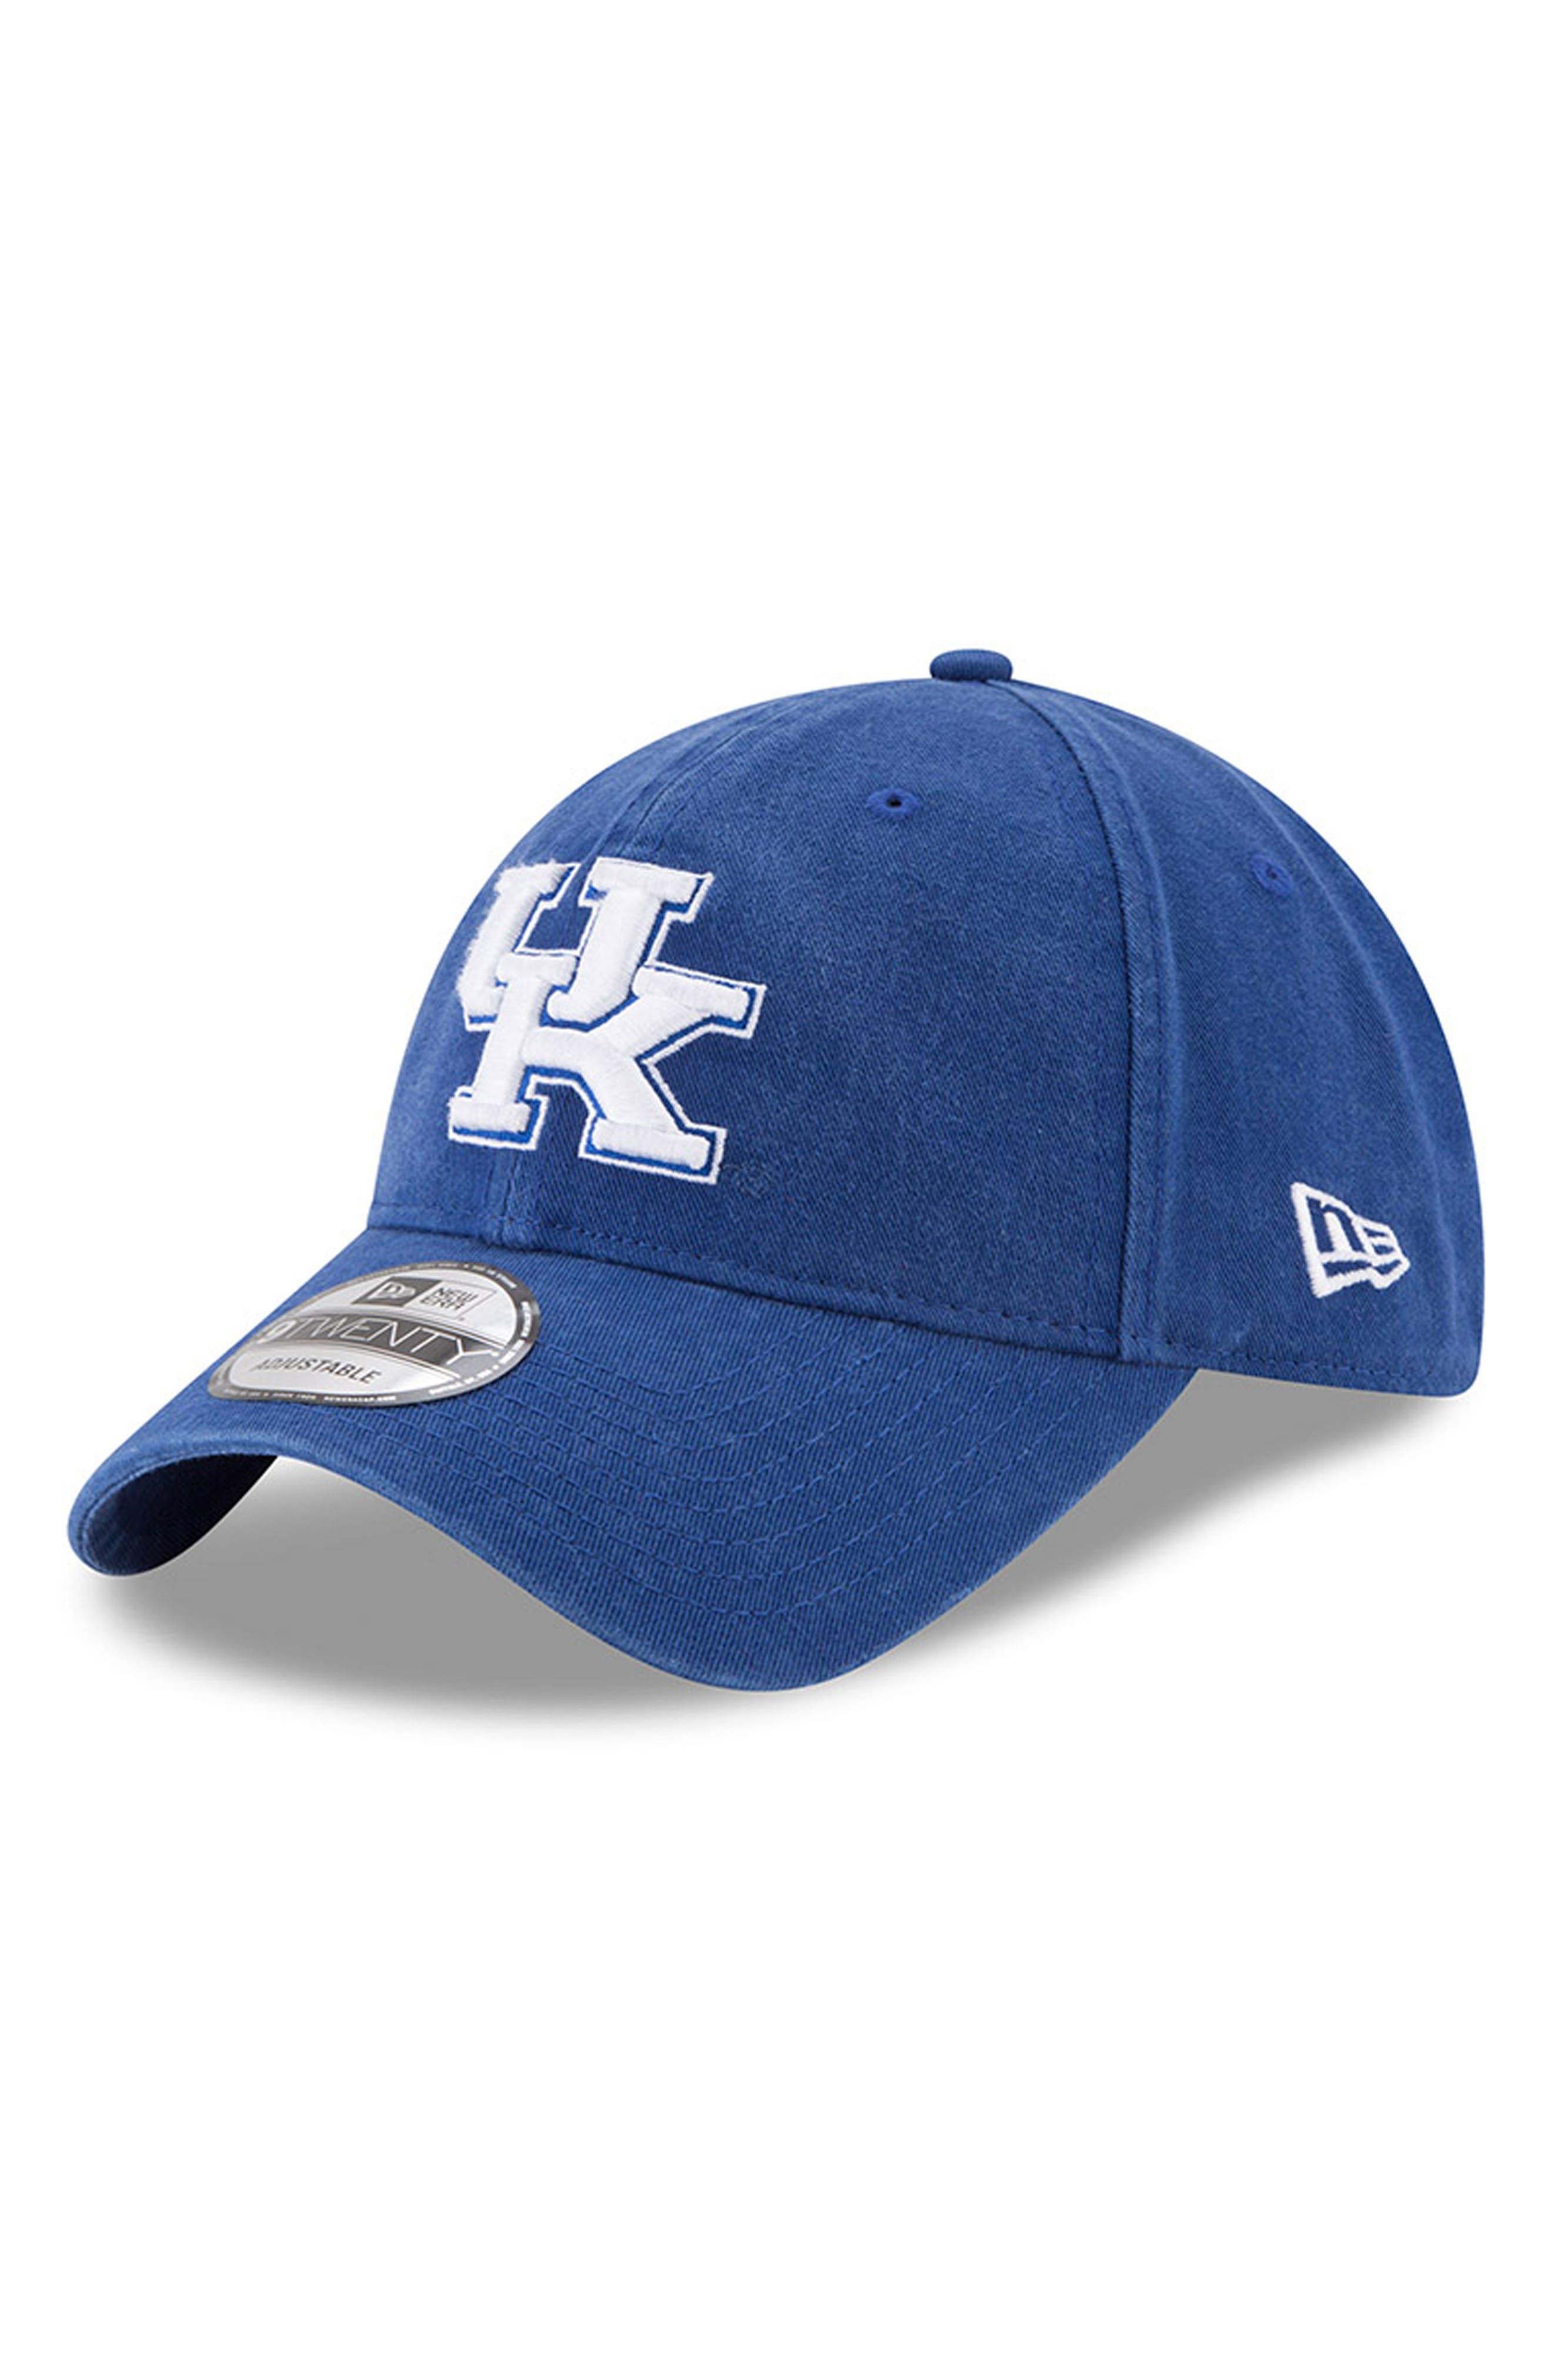 New Era Collegiate Core Classic - Kentucky Wildcats Baseball Cap,                         Main,                         color,